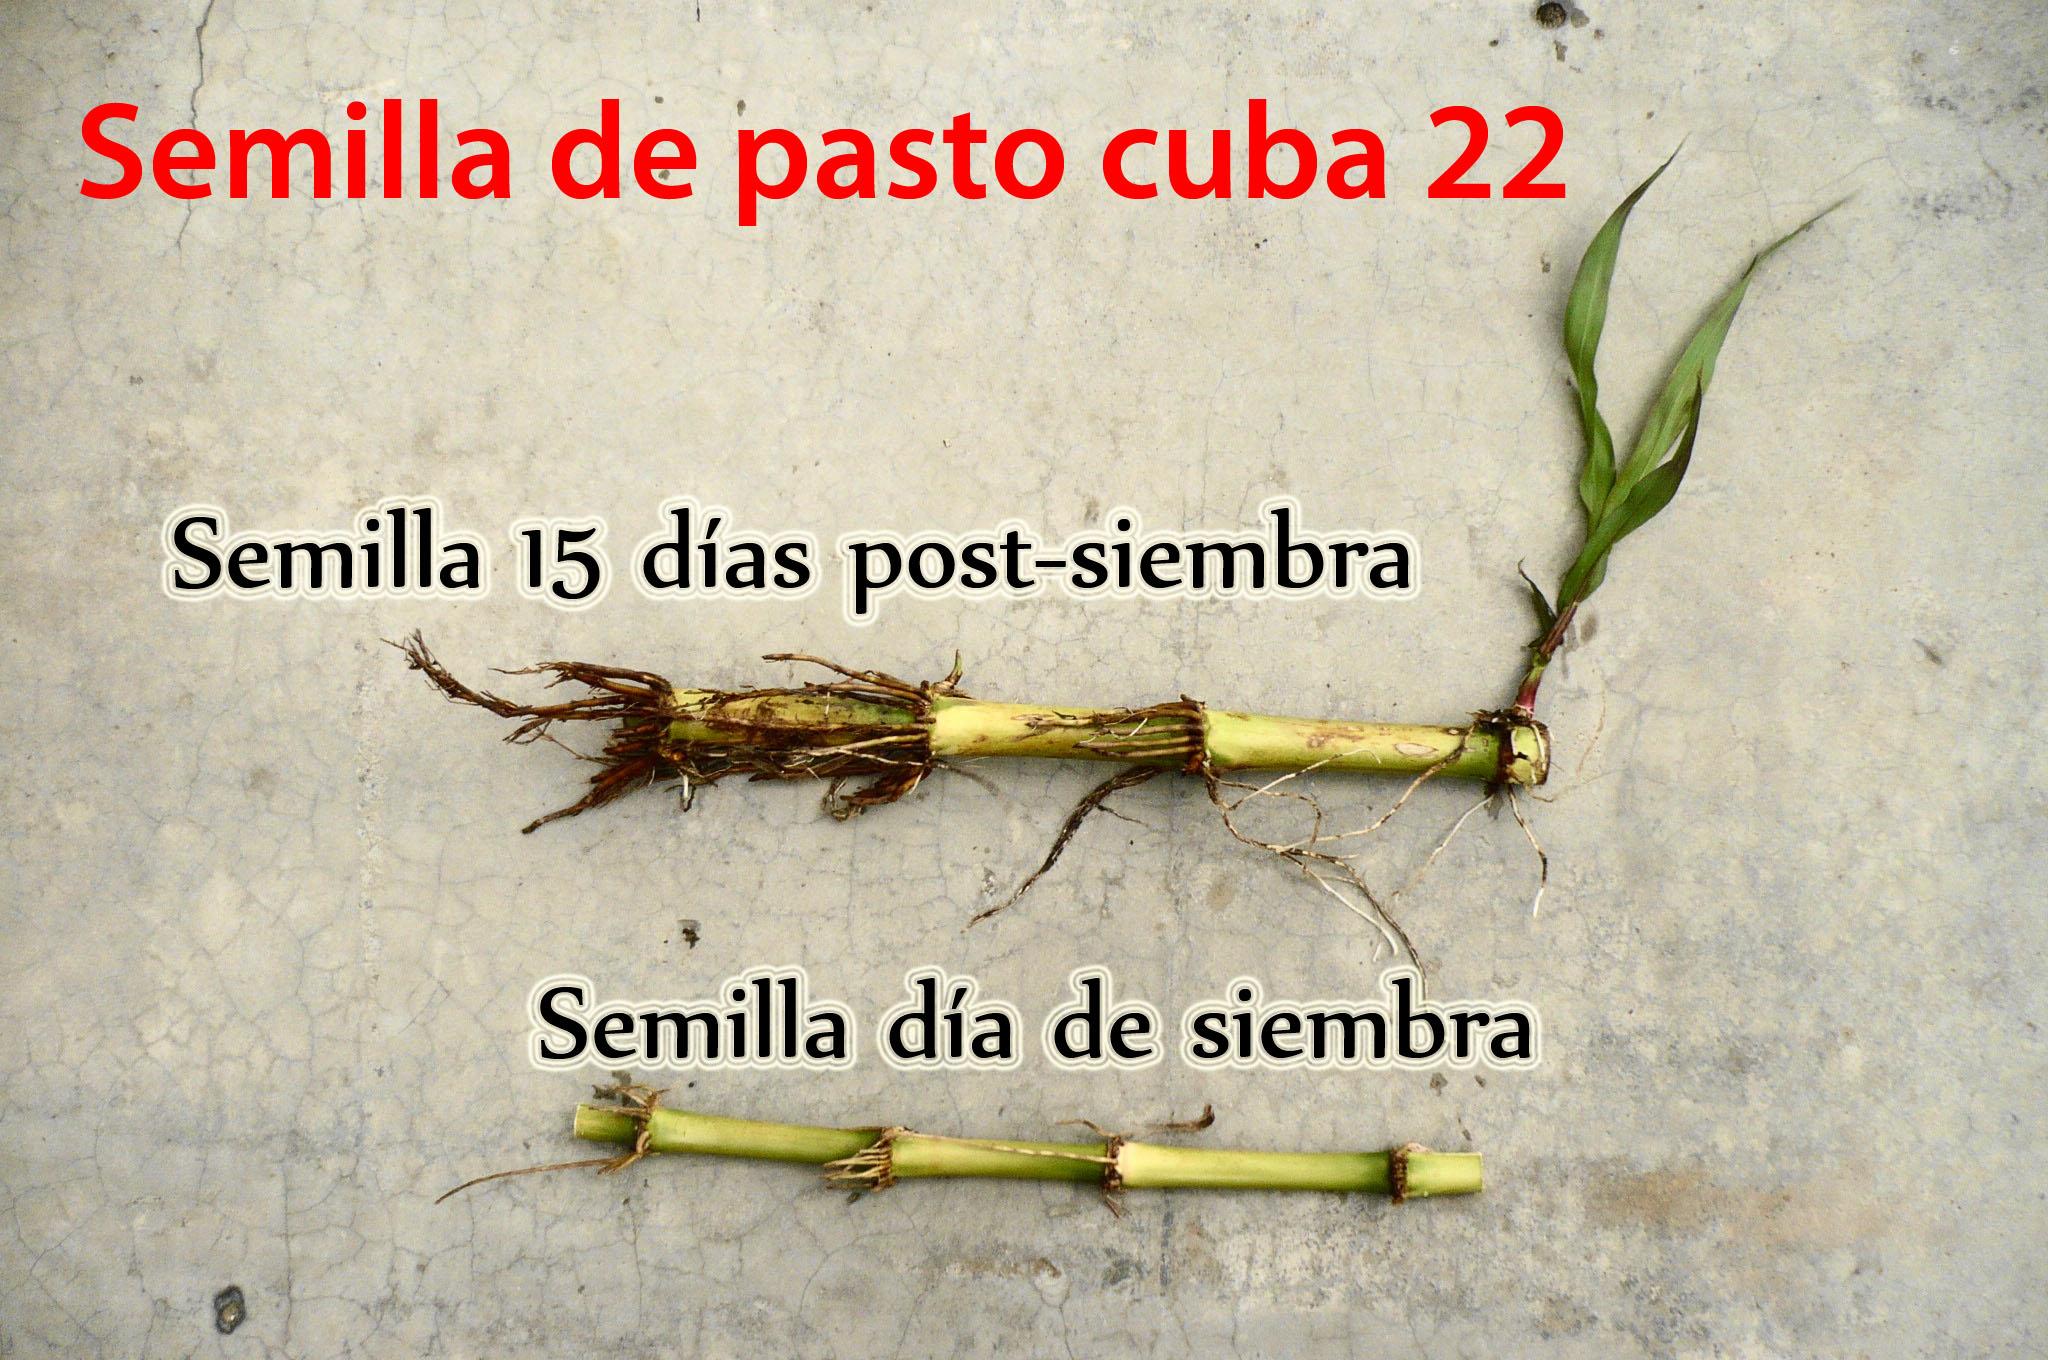 semilla de pasto cuba 22